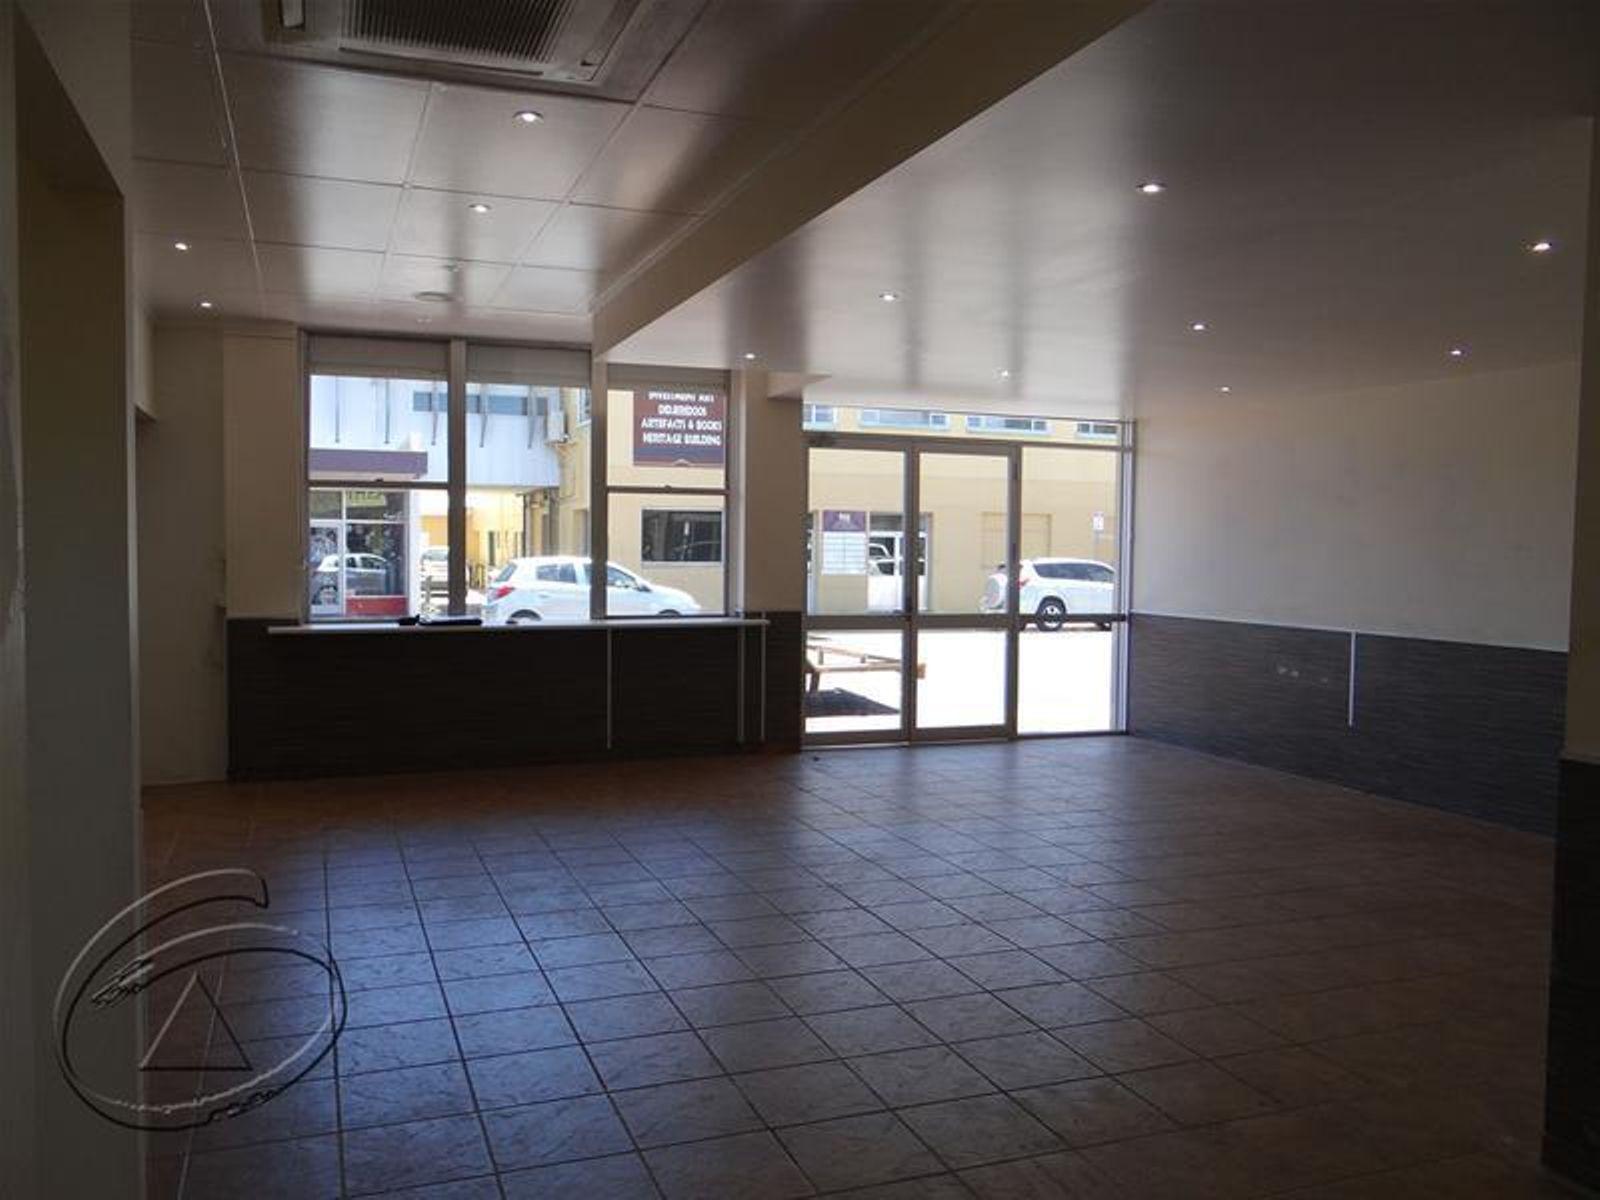 4&5/70 Todd Street, Alice Springs, NT 870